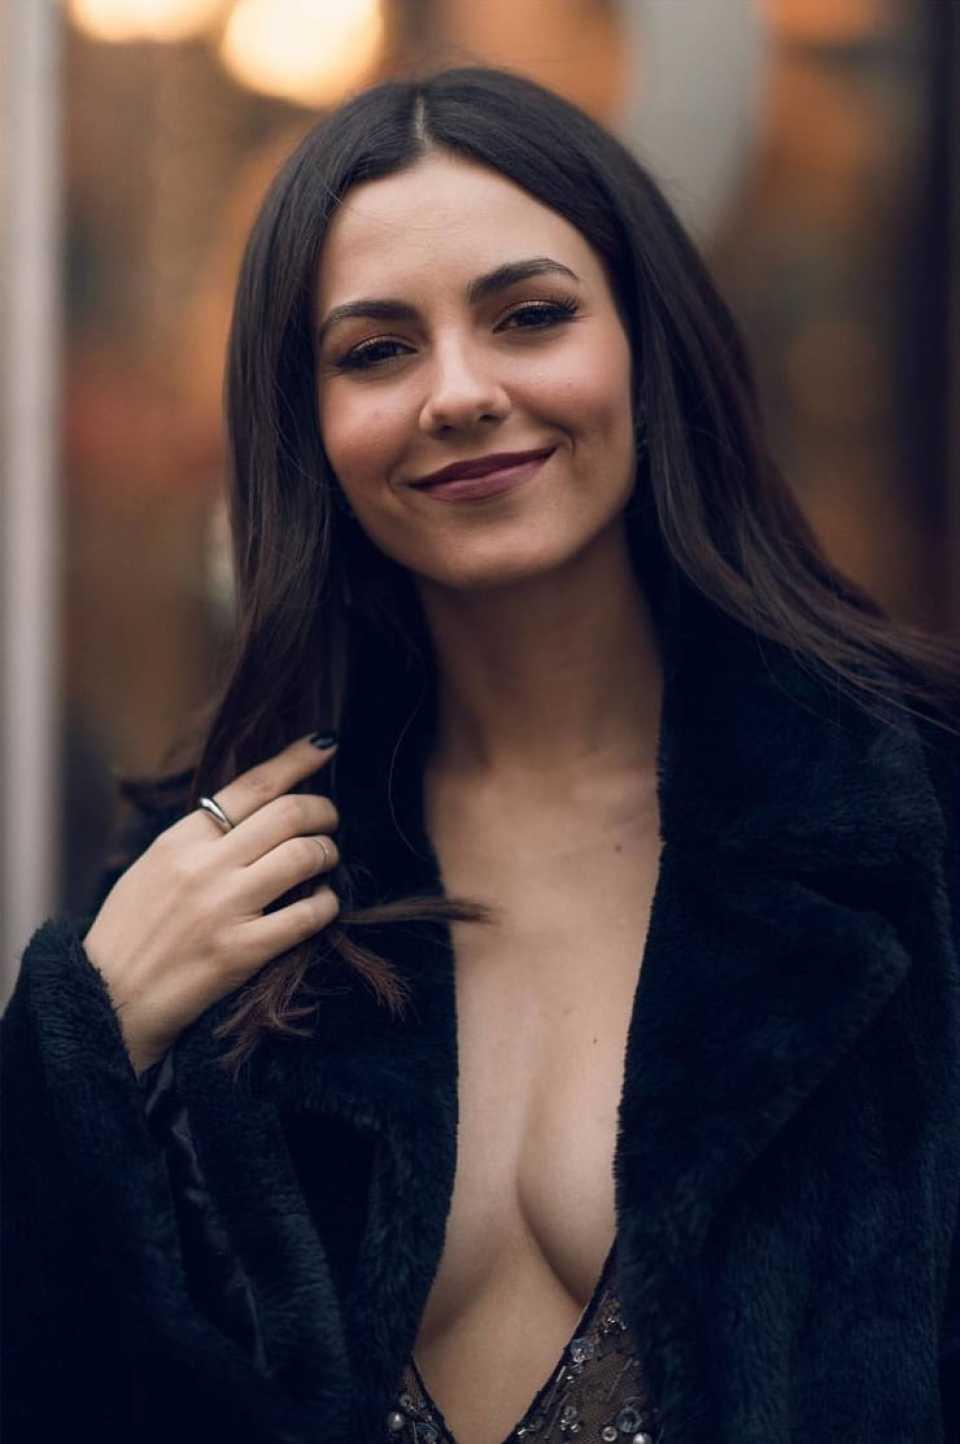 Victoria Justice - Personal pics